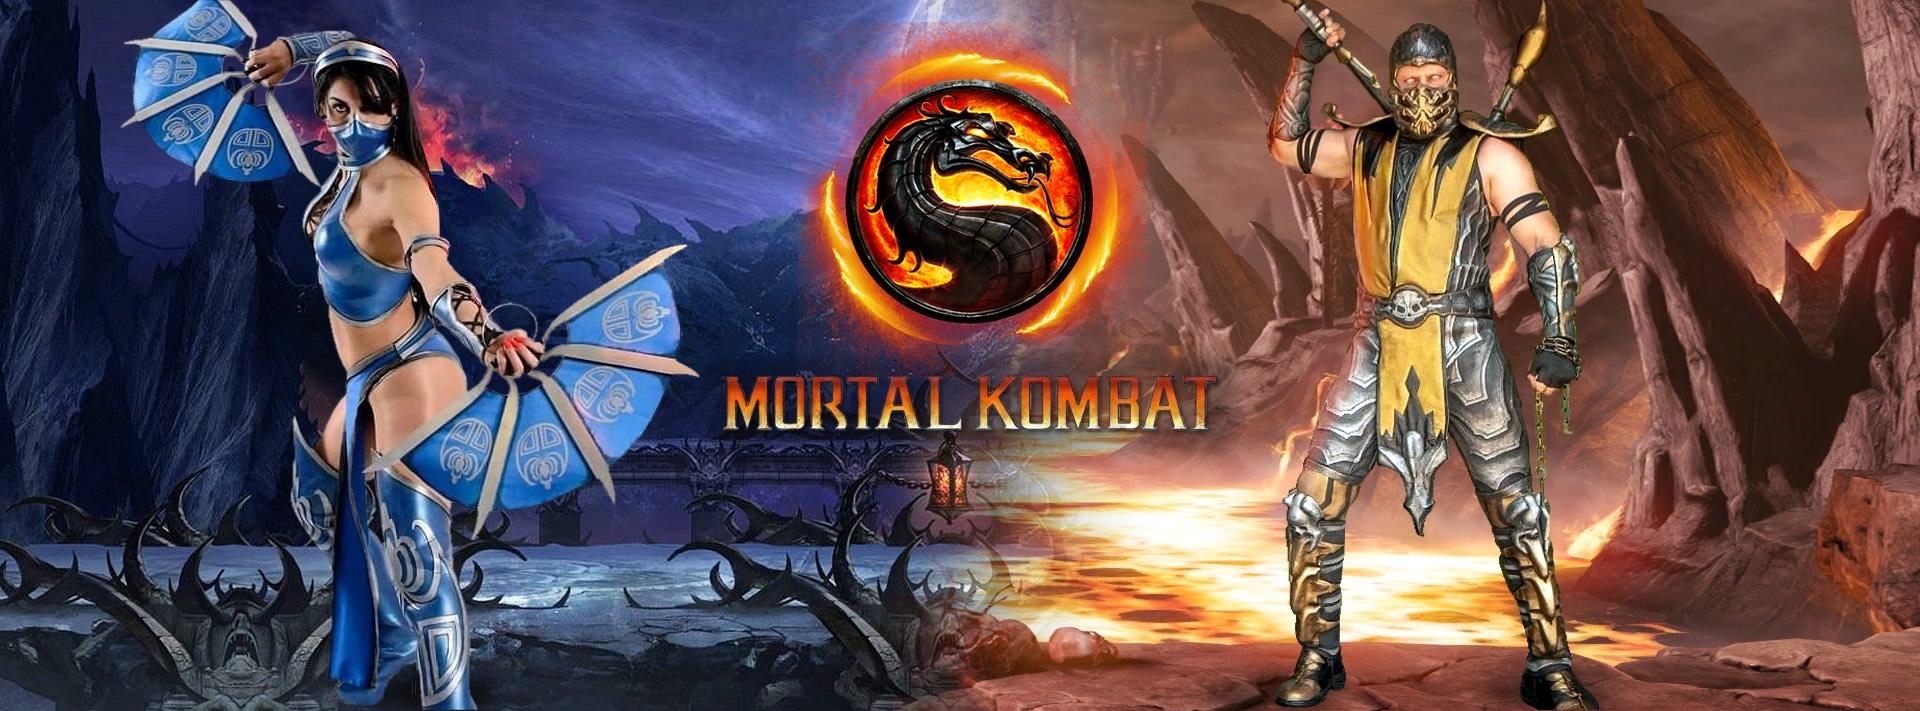 backgtound mk - Mortal Kombat - Cosplayers Josi e André